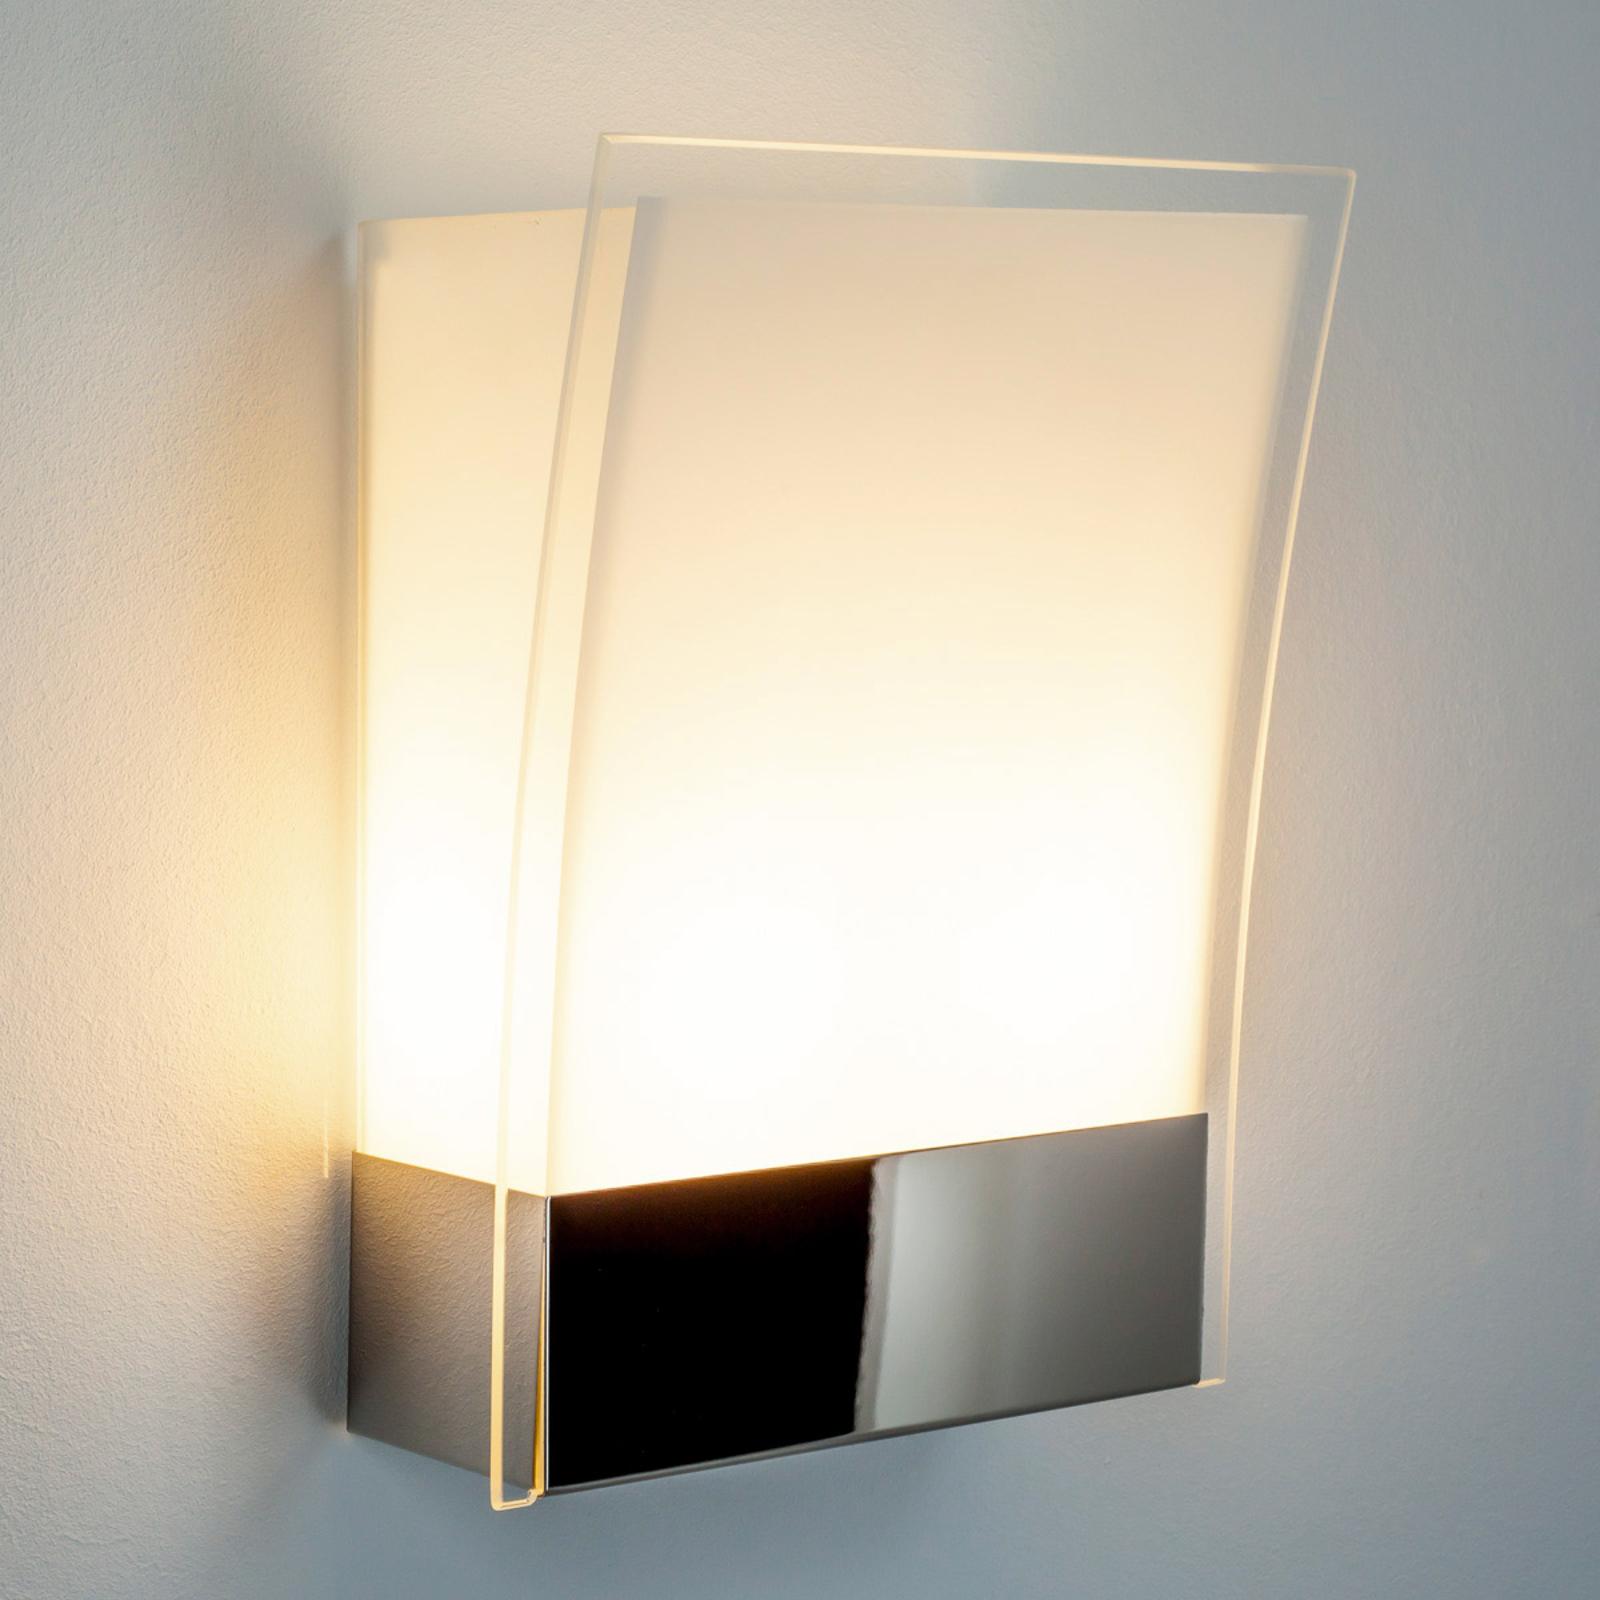 Malthe - moderne vegglampe i glass og metall.